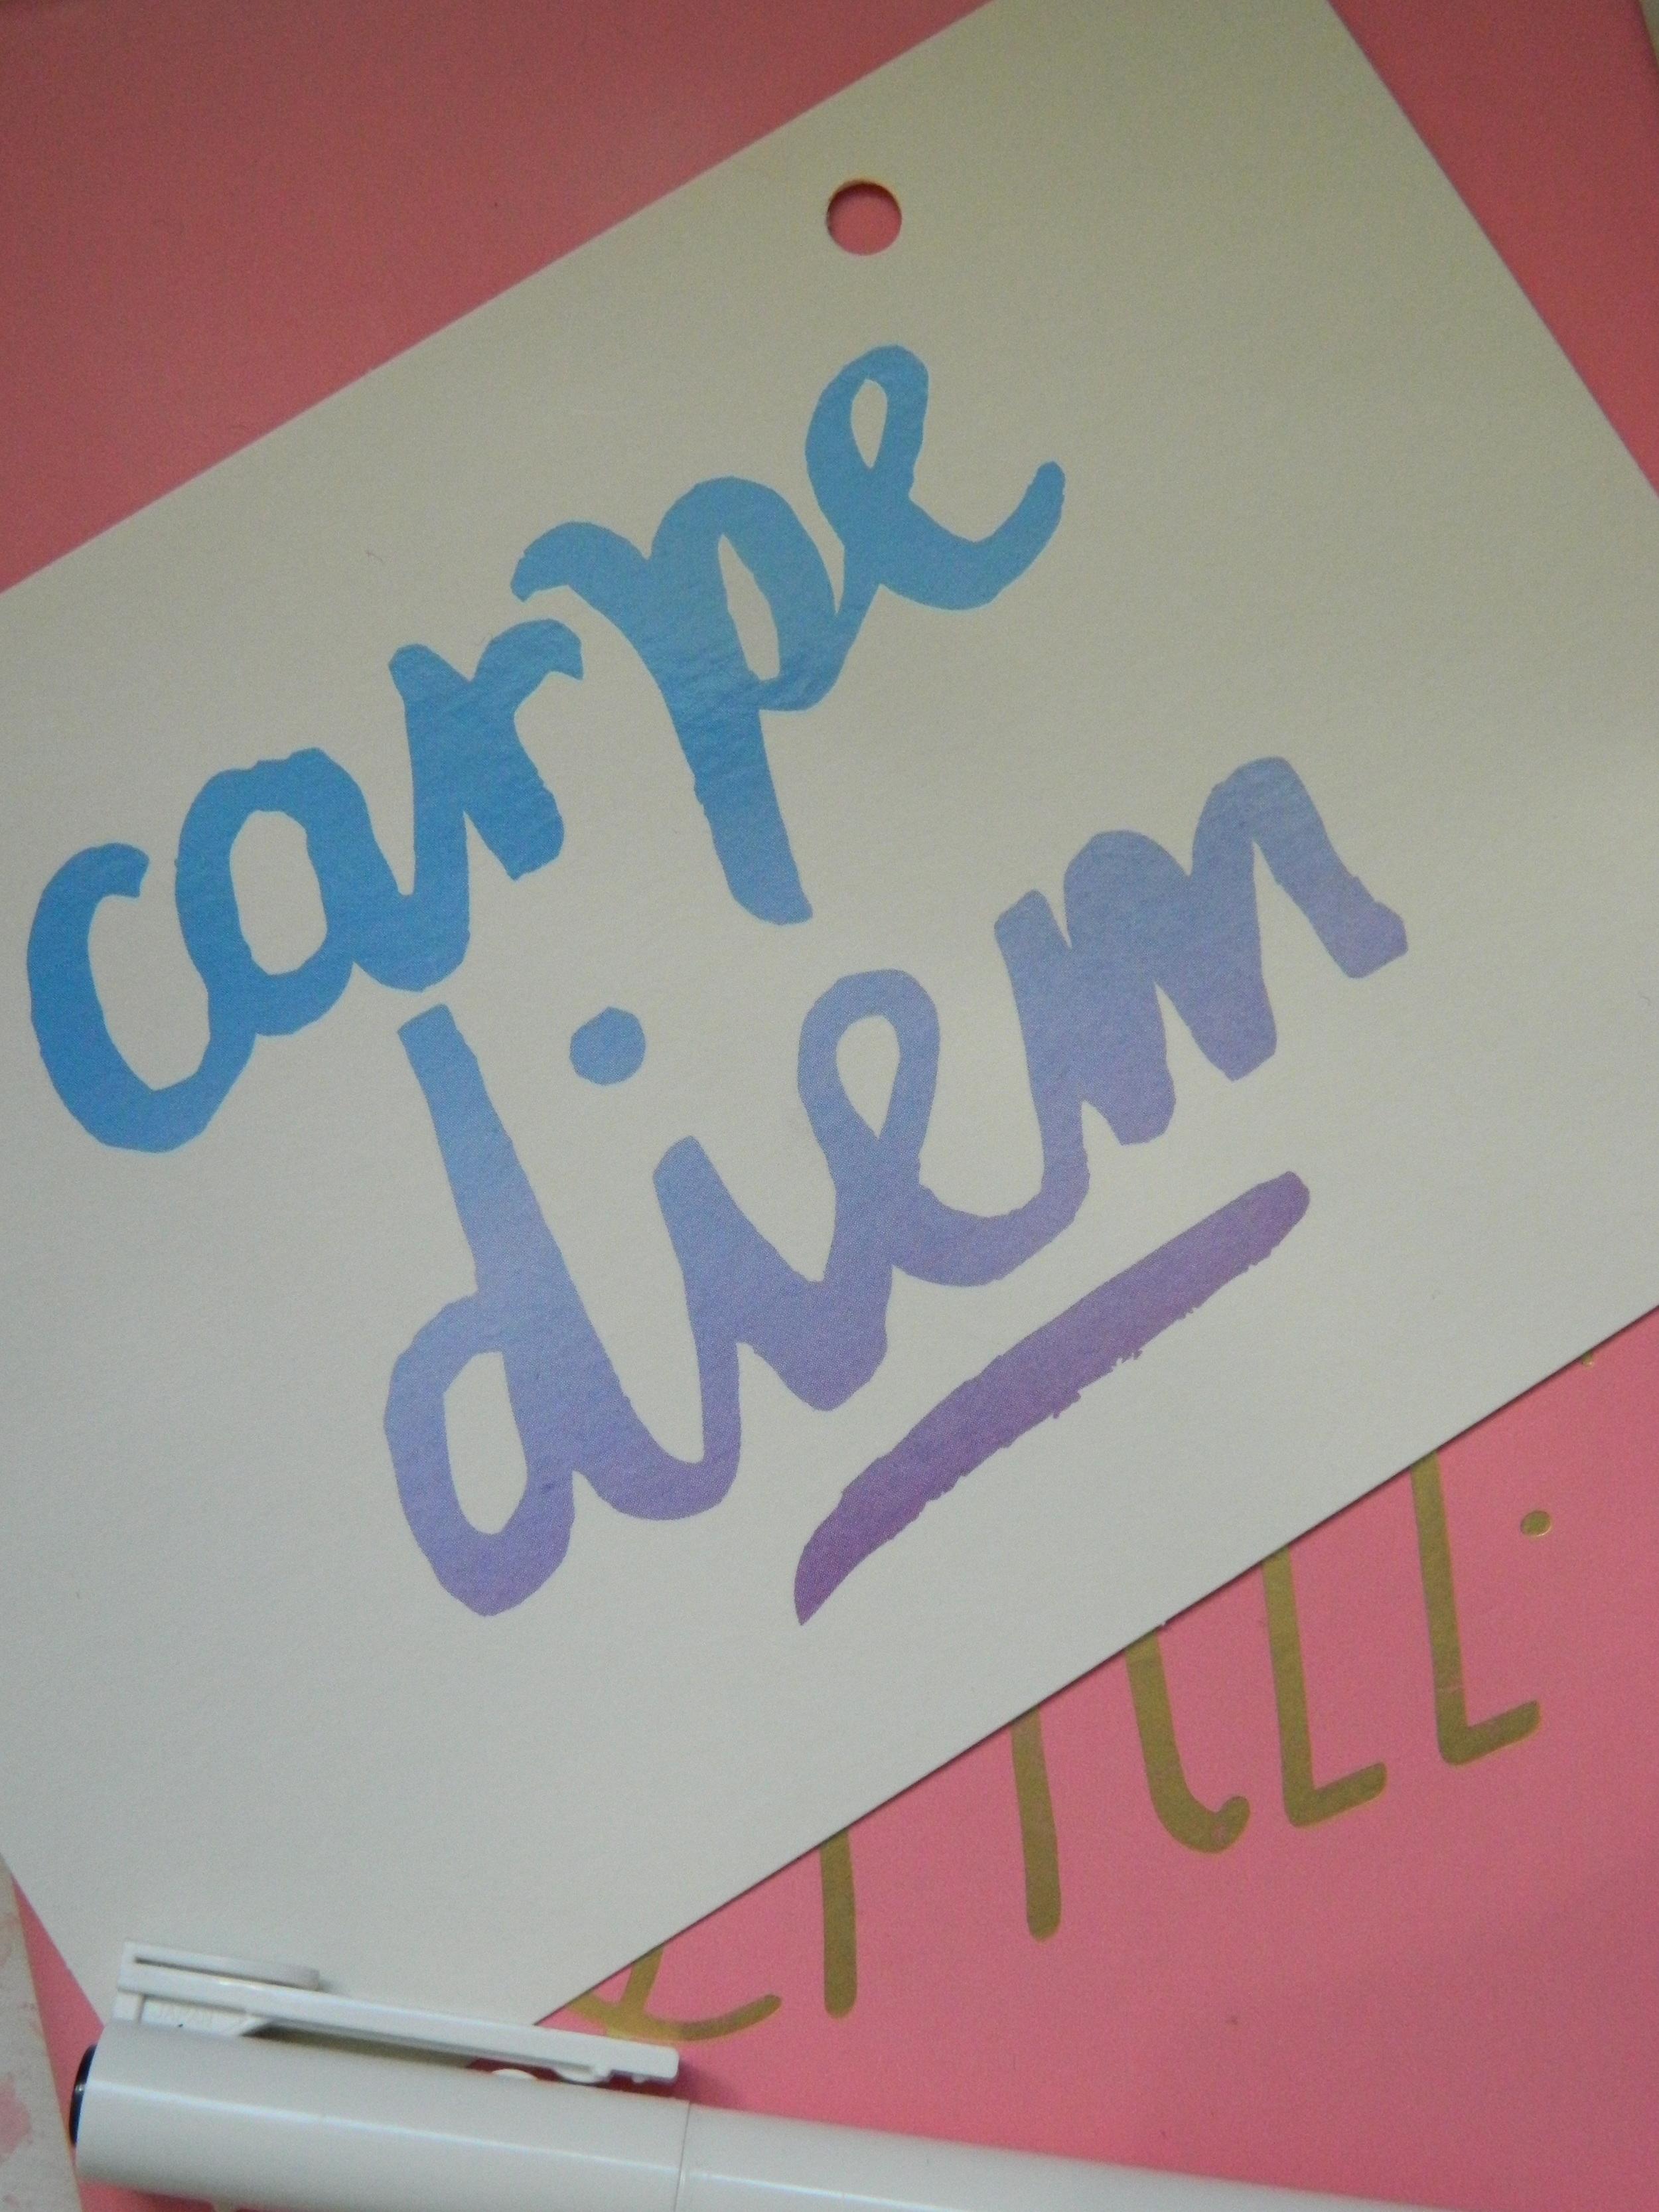 Carpe Diem postcard from Paperchase.